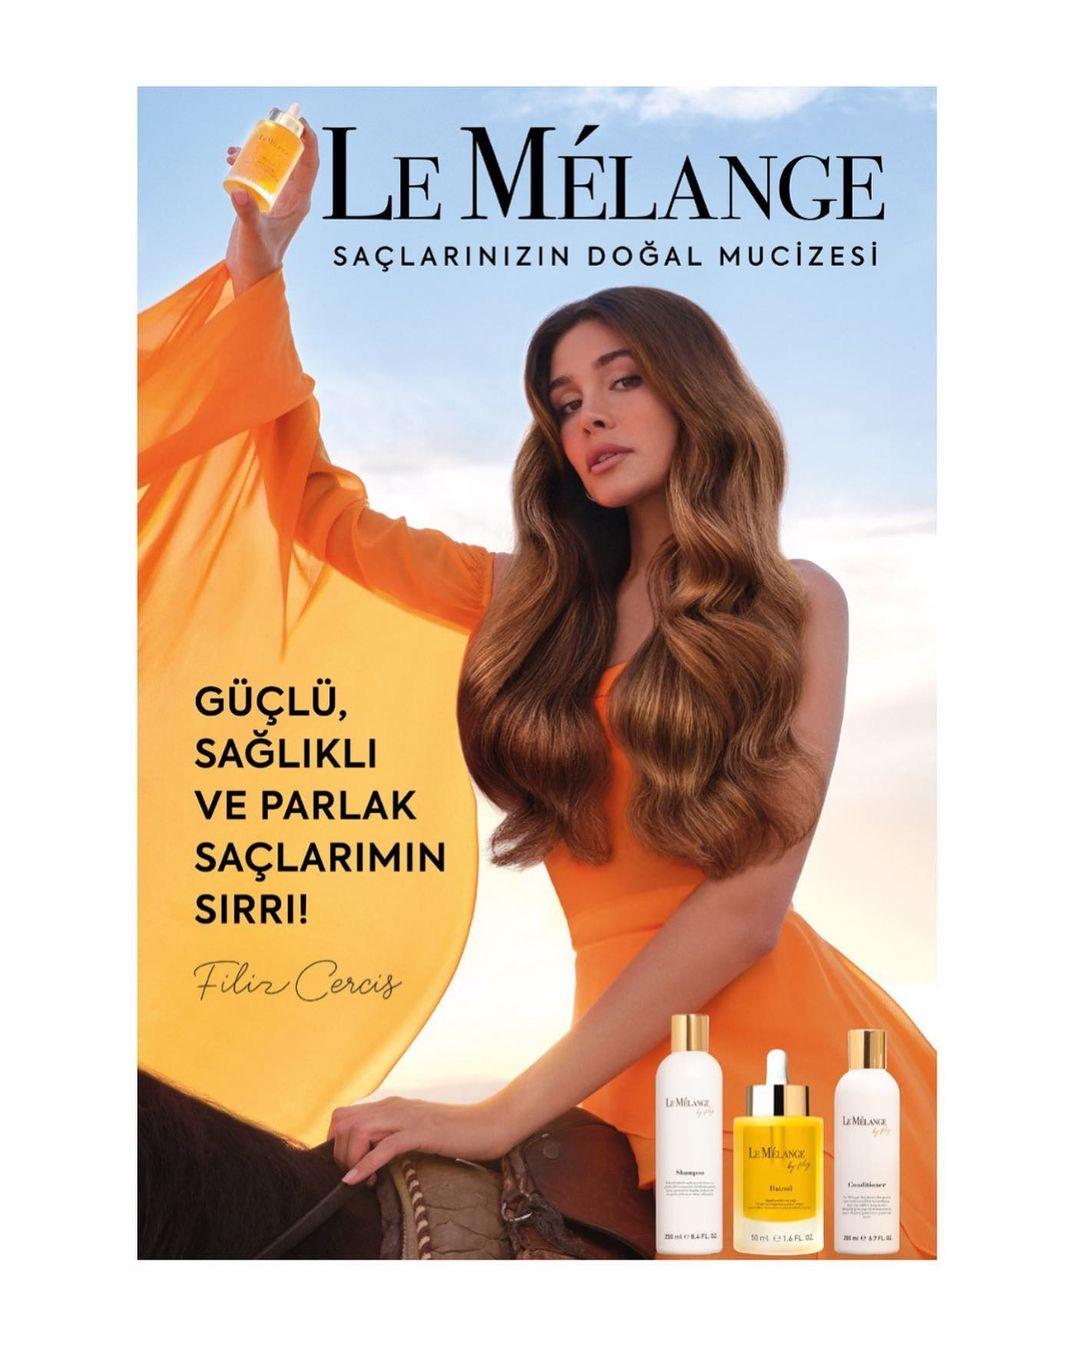 LE MELANGE CAMPAING TURKEY